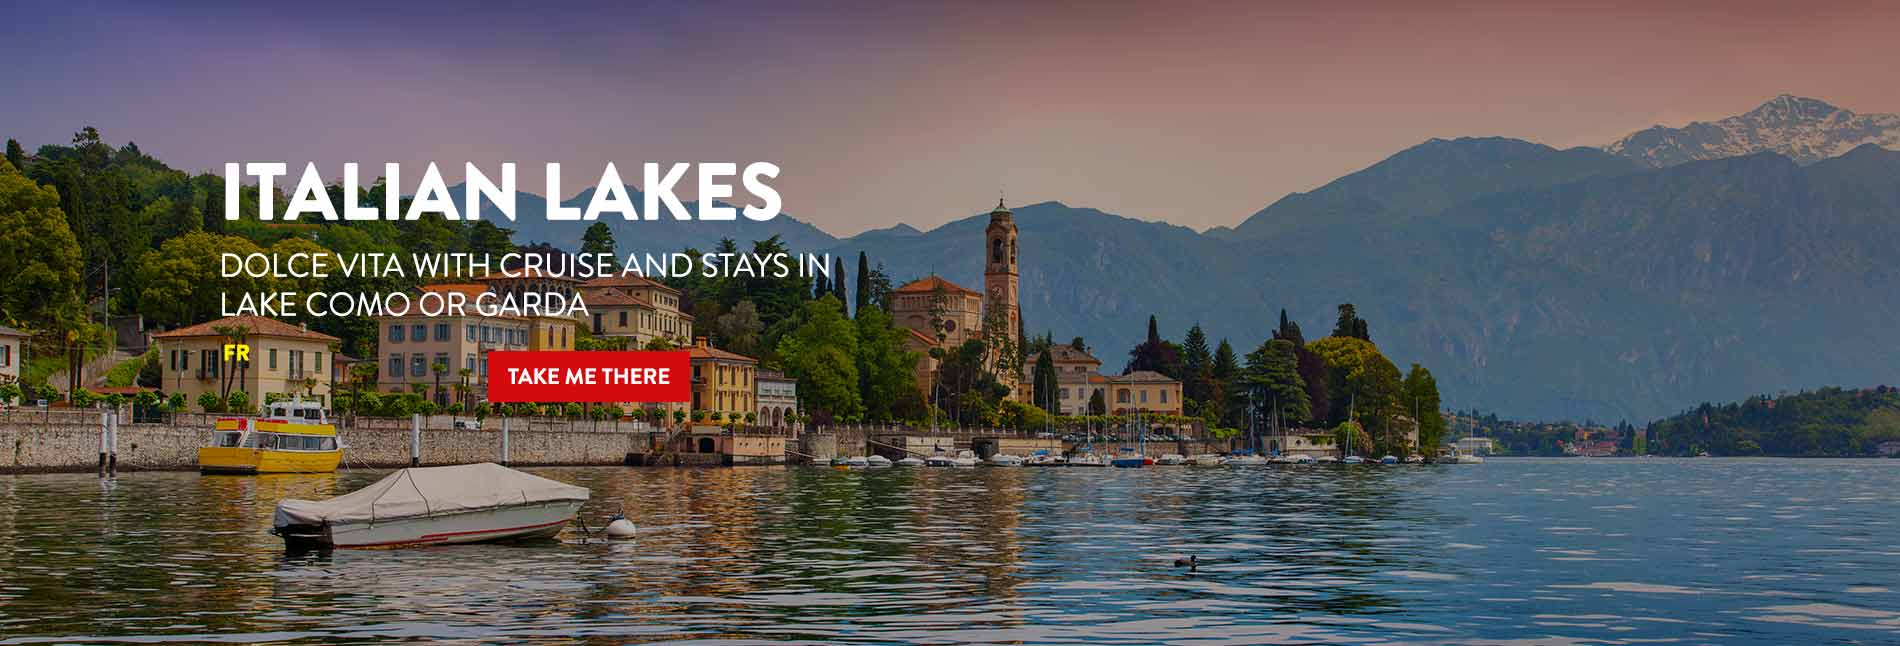 Italian Lakes Cruise Deals